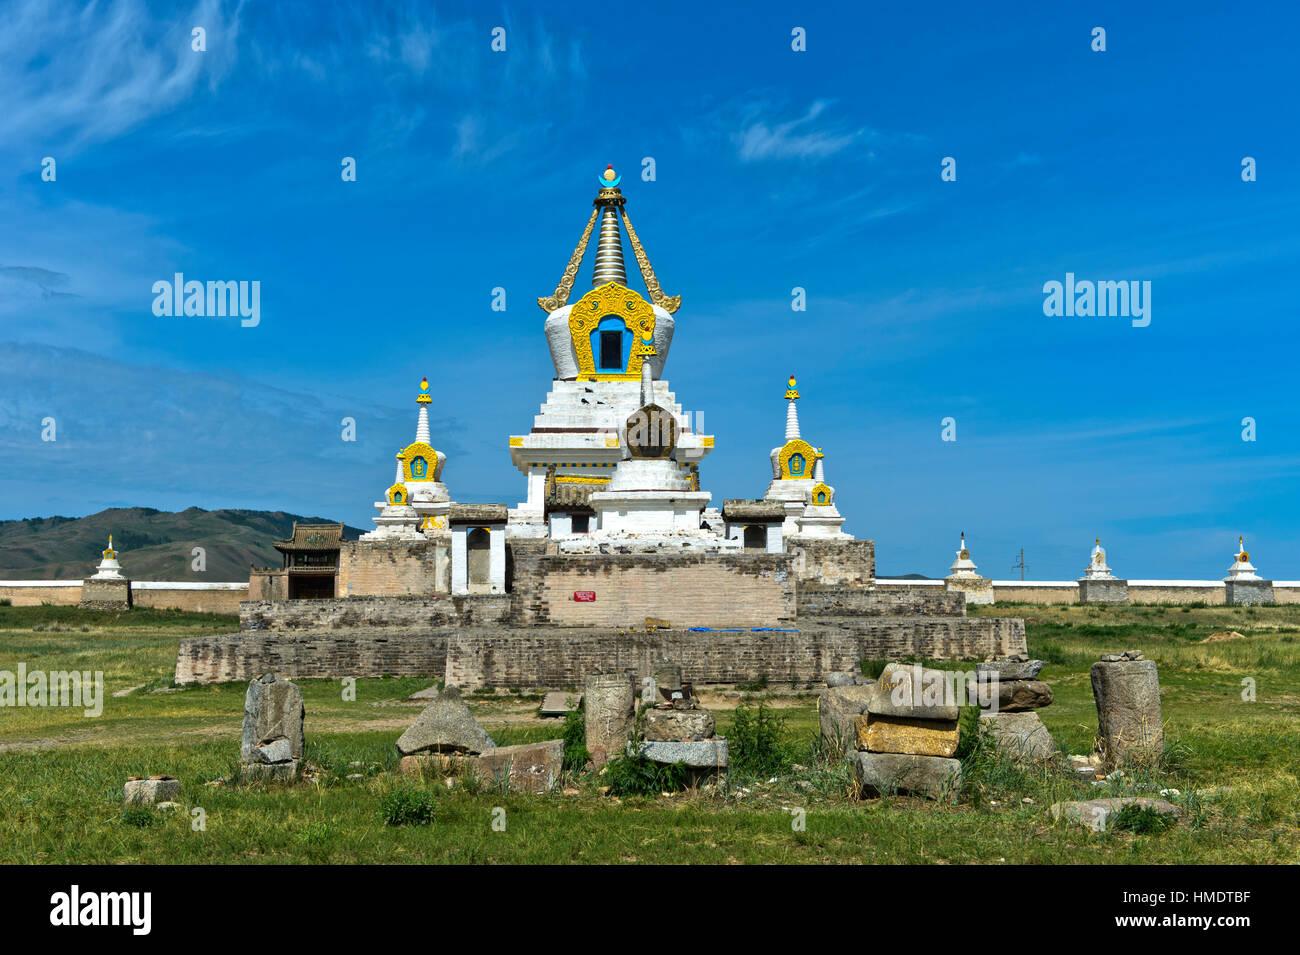 Stupa y temple, Erdene Zuu monasterio Khiid, Karakorum, Kharkhorin, Övörkhangai Aimak, Mongolia Imagen De Stock